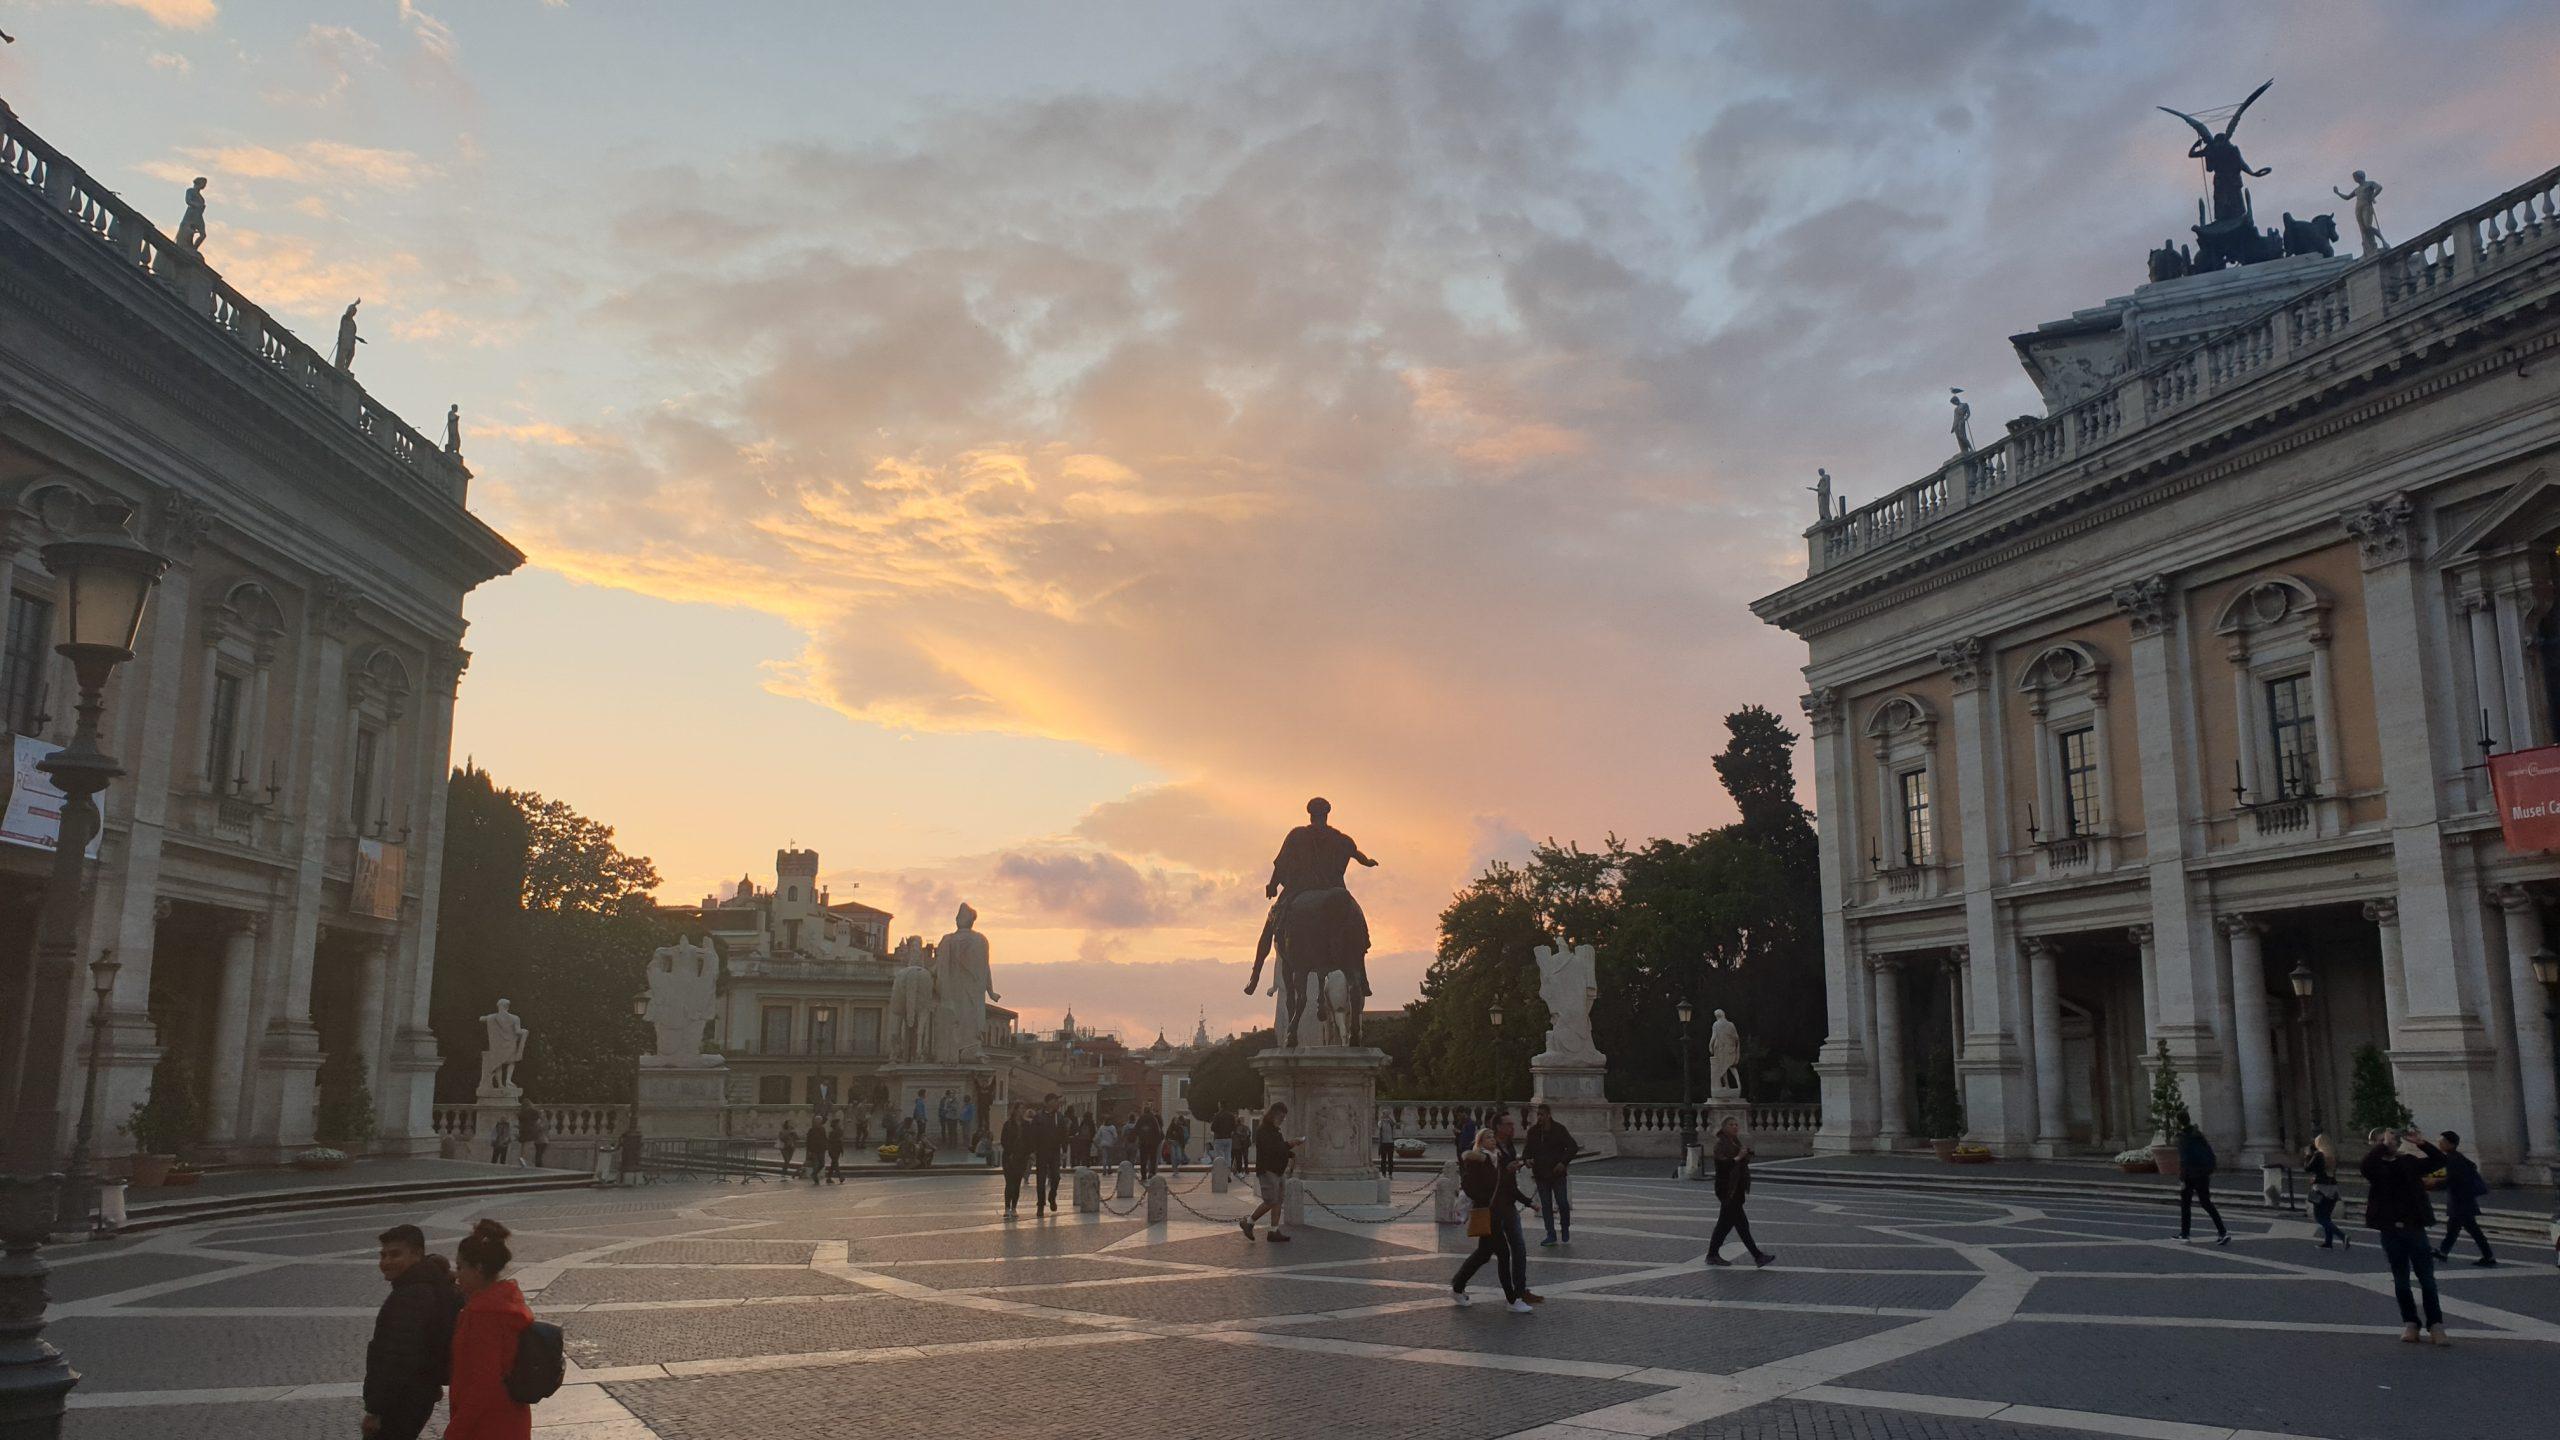 Seminar – The Seven Hills of Rome